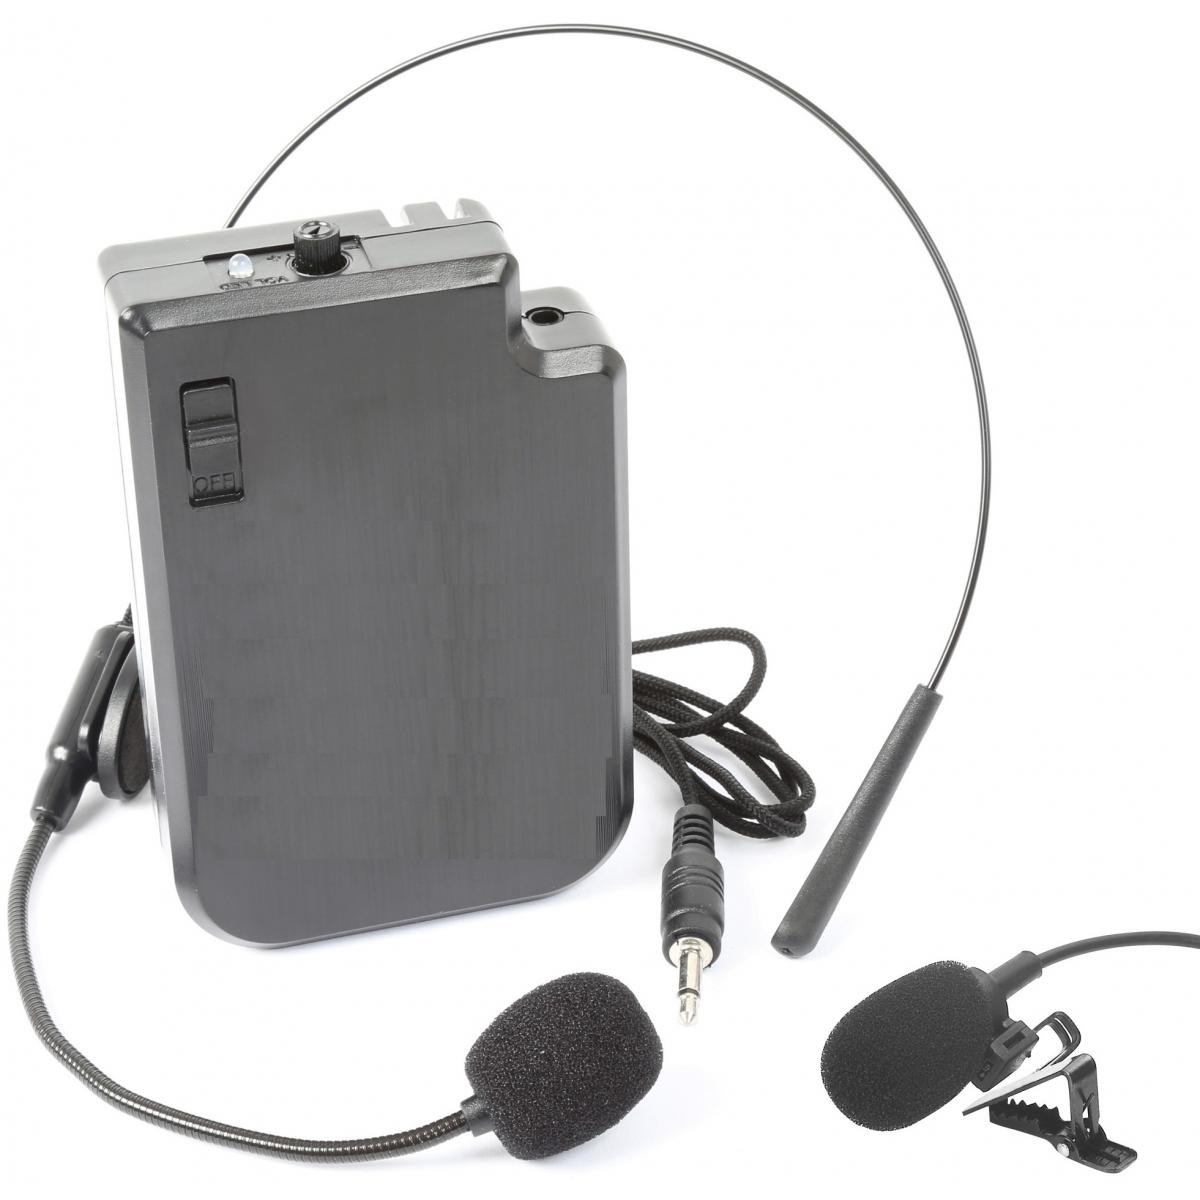 Micros sonos portables - Energyson - WIRELESS VHF HEADSET - ST-010